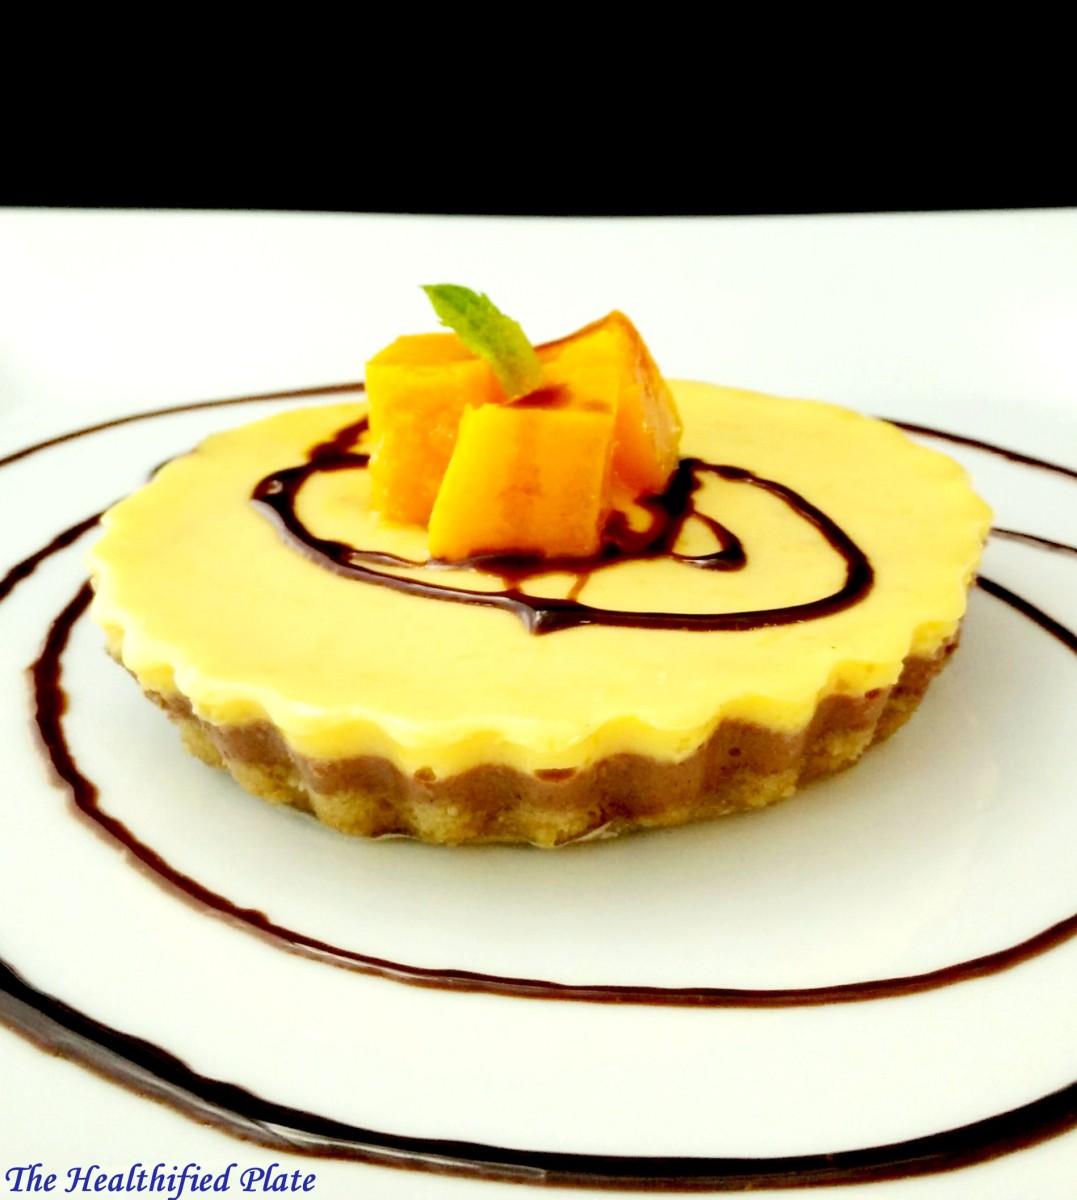 Baked Yogurt Cheesecake(lets) with Mango and Dark Chocolate